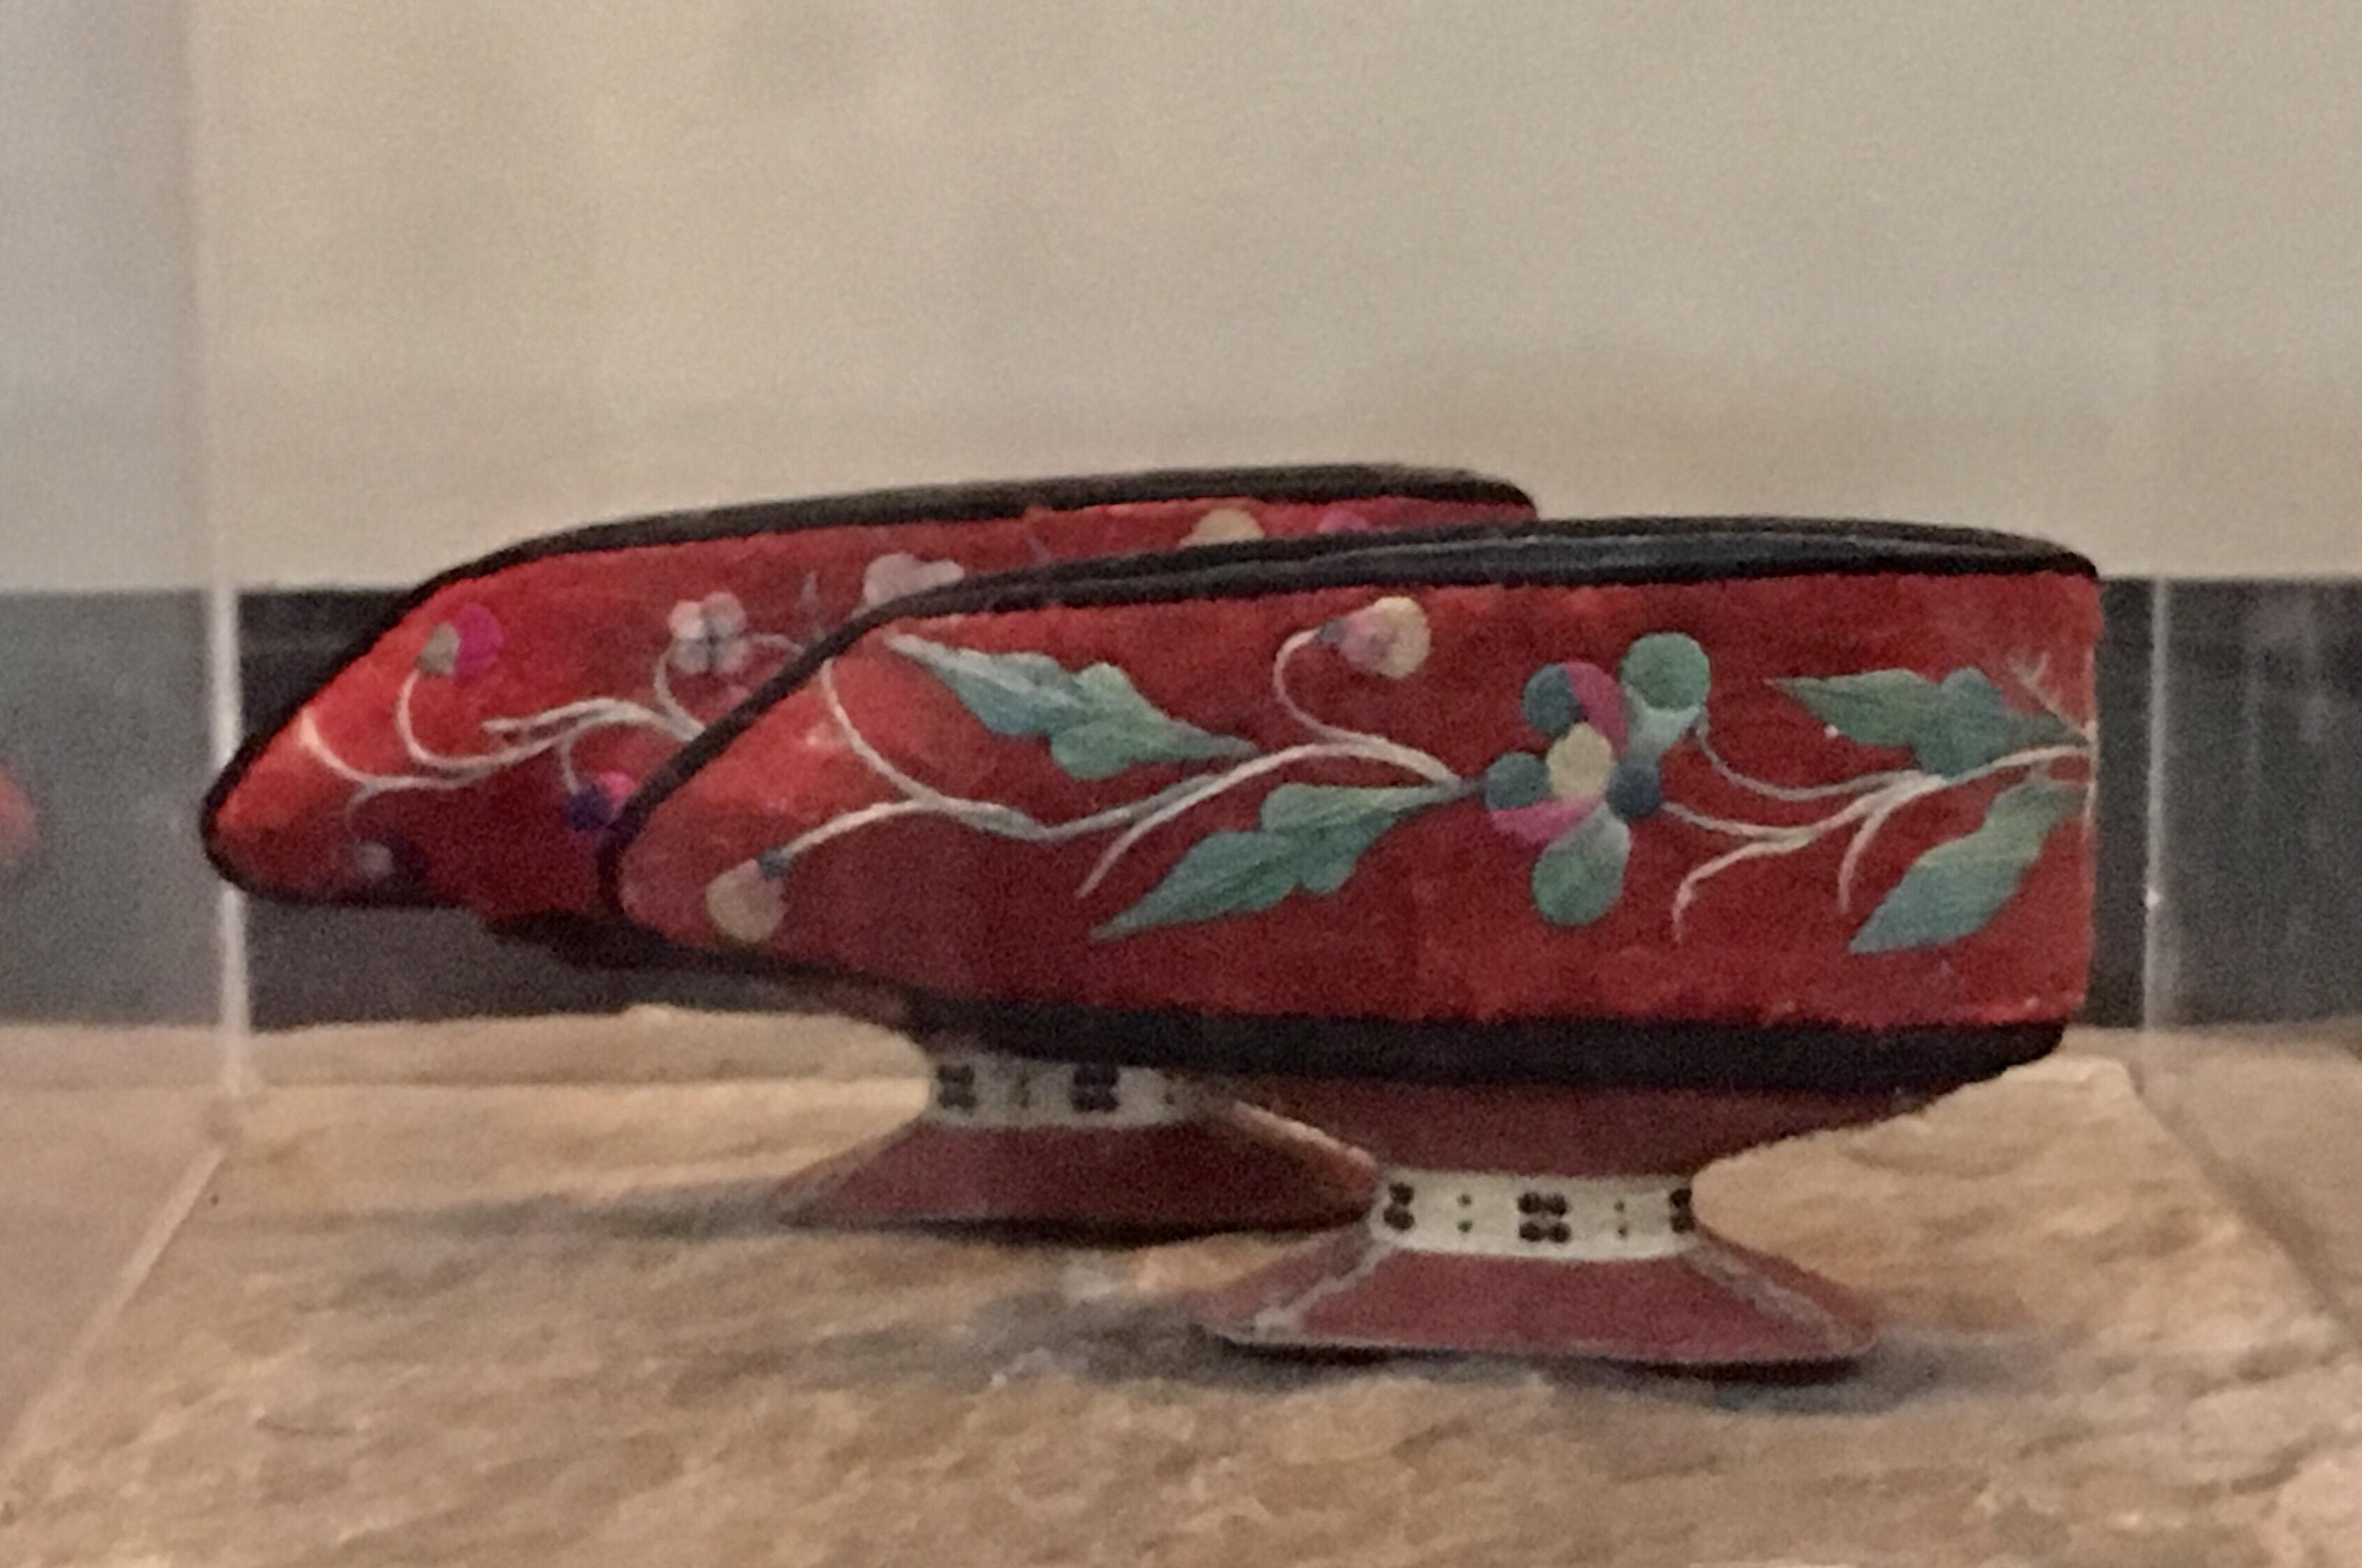 foot binding museum, Wuzhen, foot binding, golden lotus, china, foot binding china, image by jade Jackson